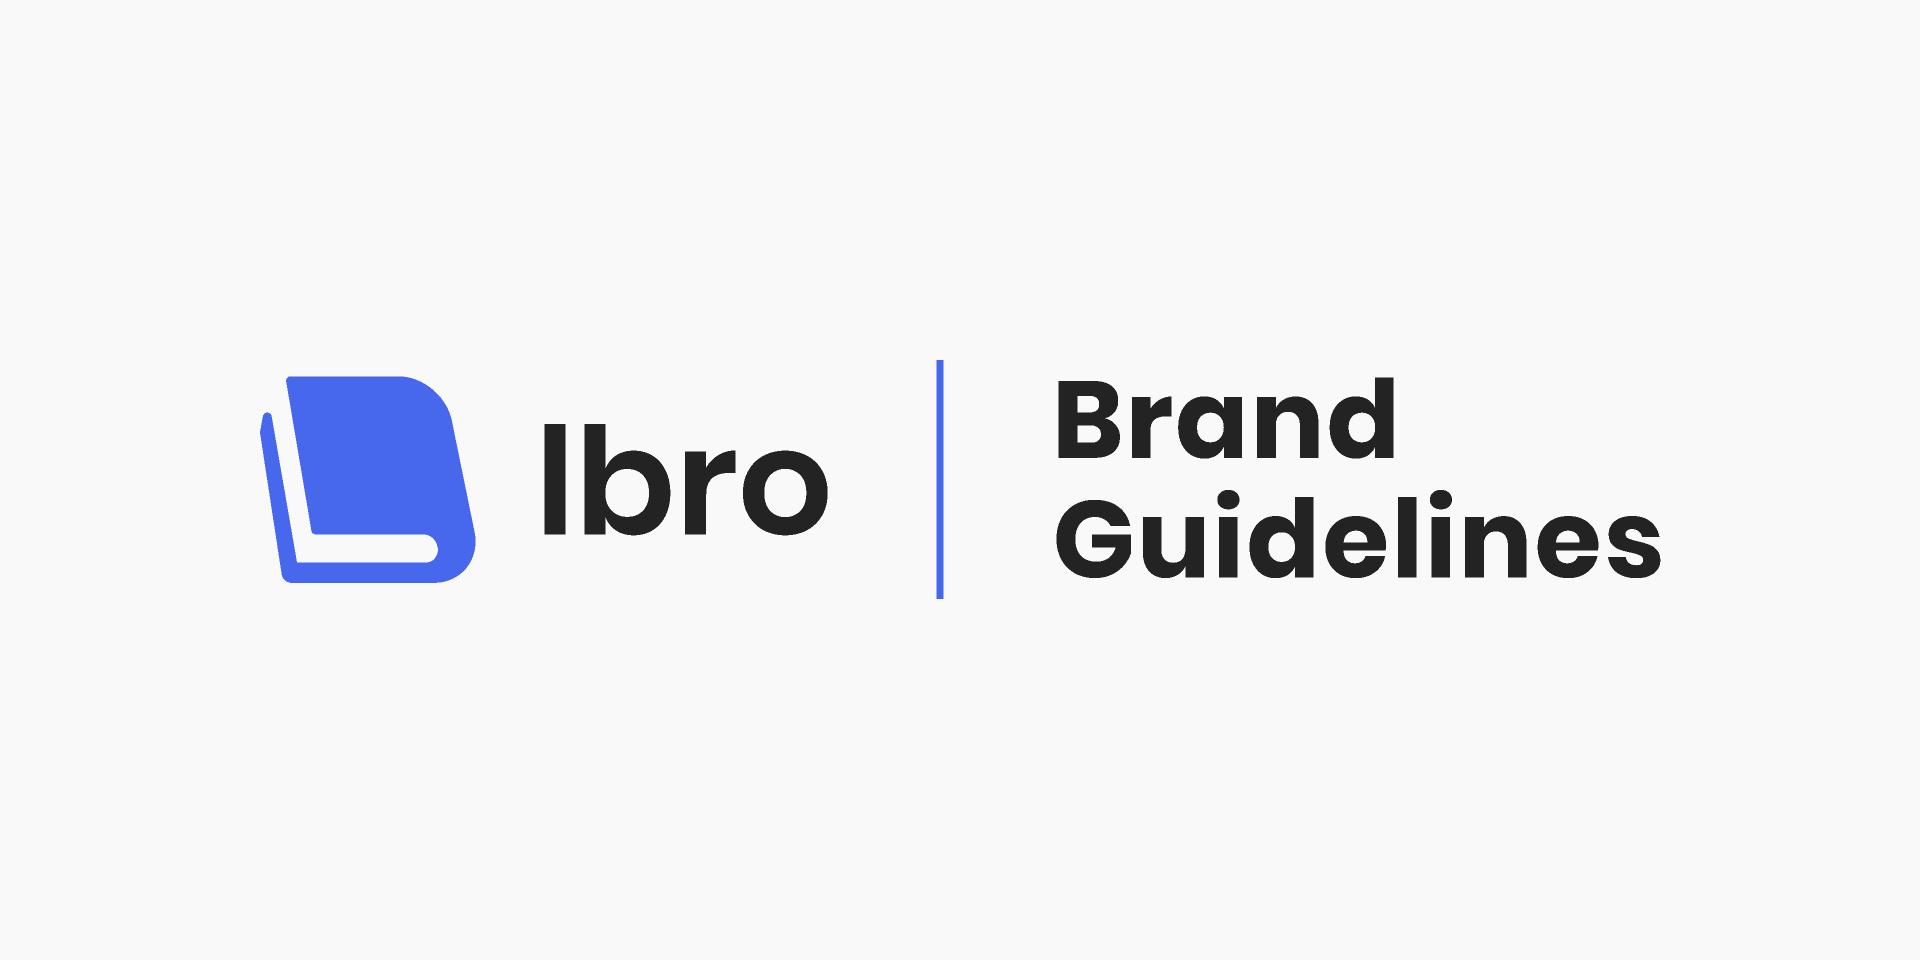 Freebie Figma Lbro   Brand Guidelines